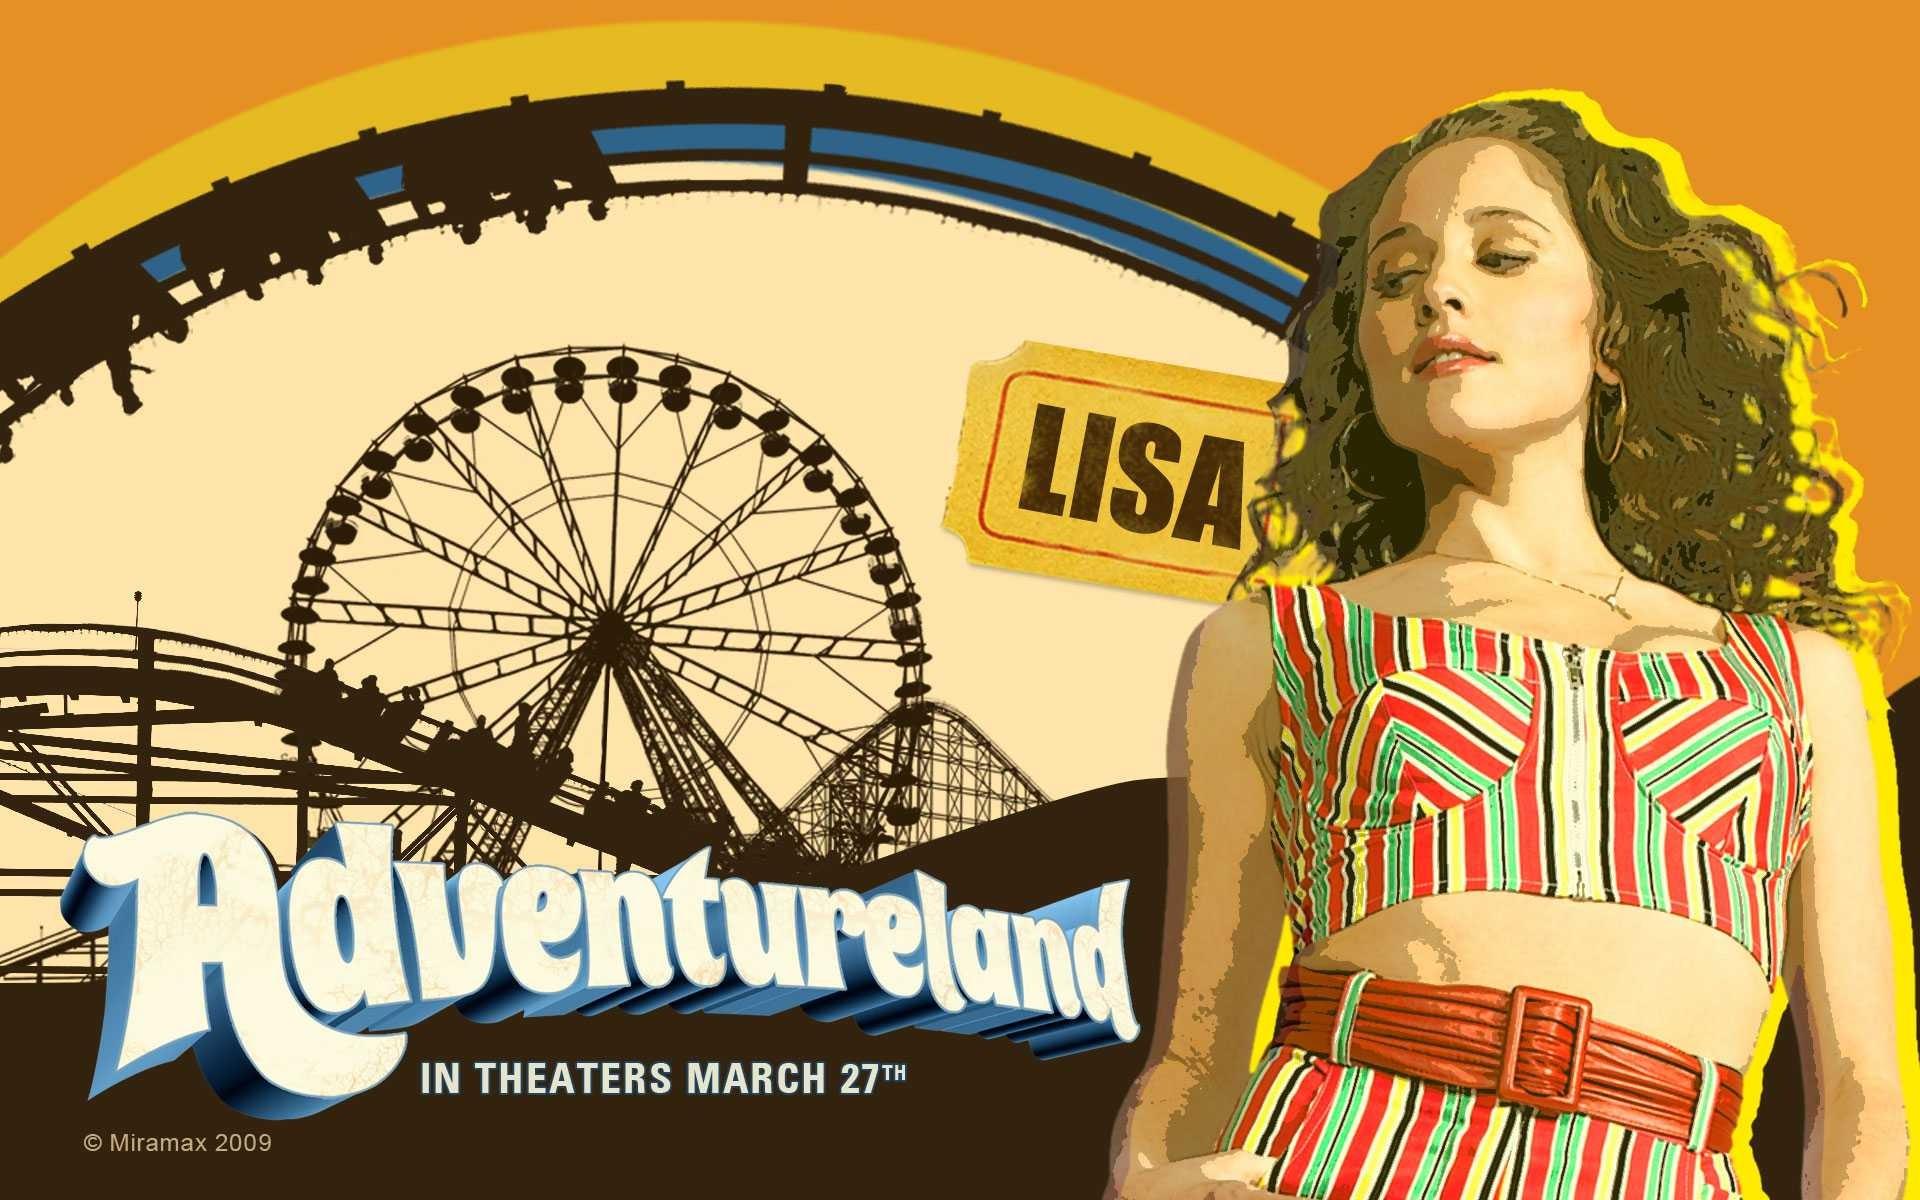 Un wallpaper del film Adventureland con Margarita Levieva